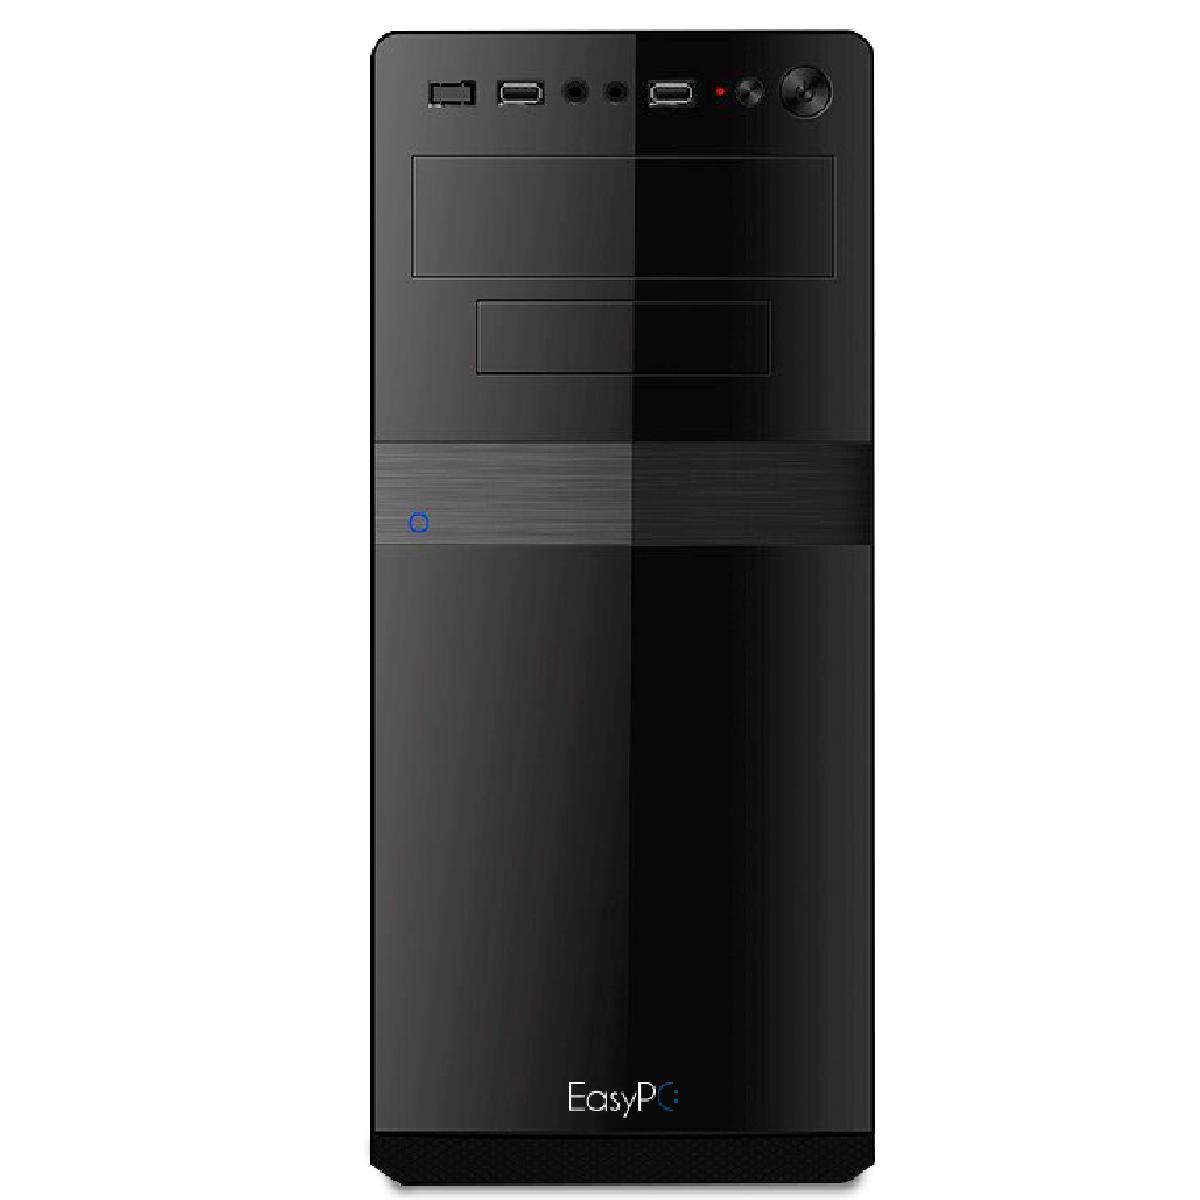 Computador T-Home EasyPc Intel Dual Core J1800 / 4GB / SSD 120GB / 300W